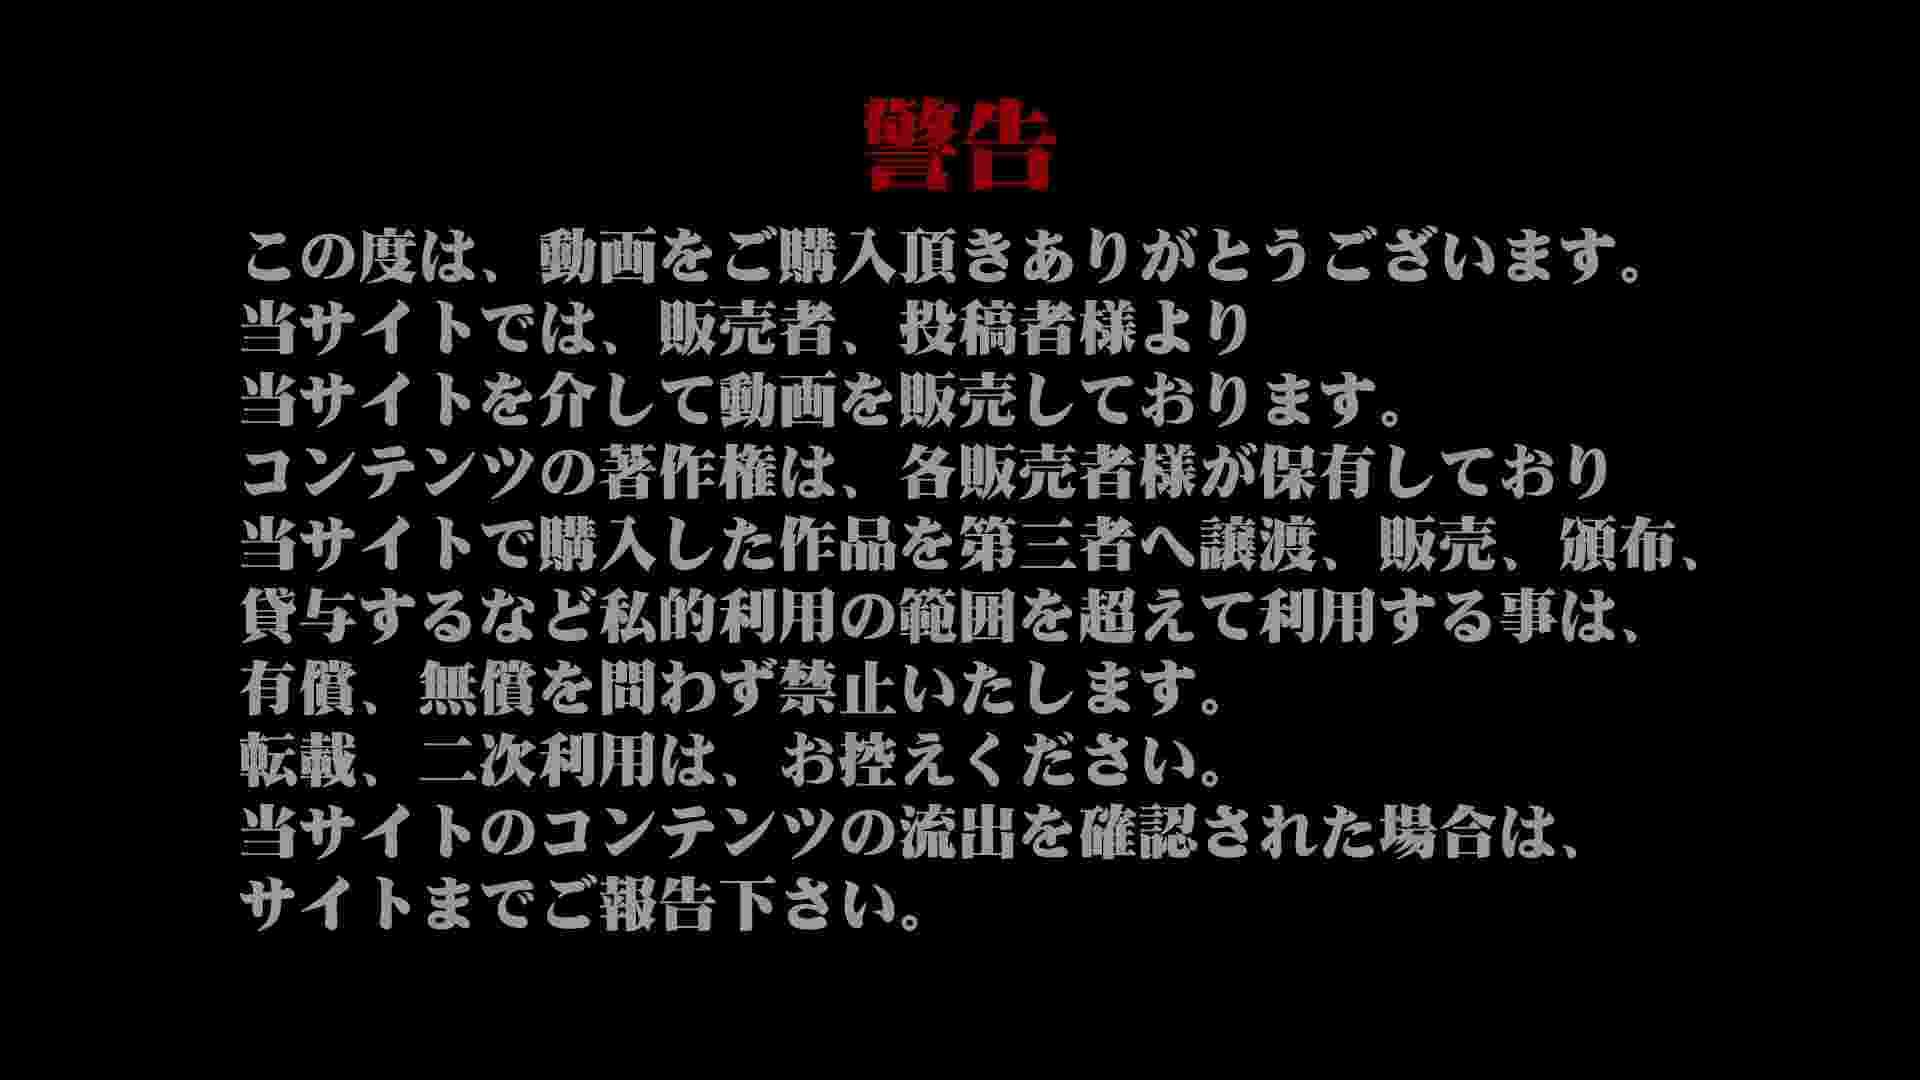 Aquaな露天風呂Vol.953 露天風呂編 | 盗撮シリーズ  90PIX 1